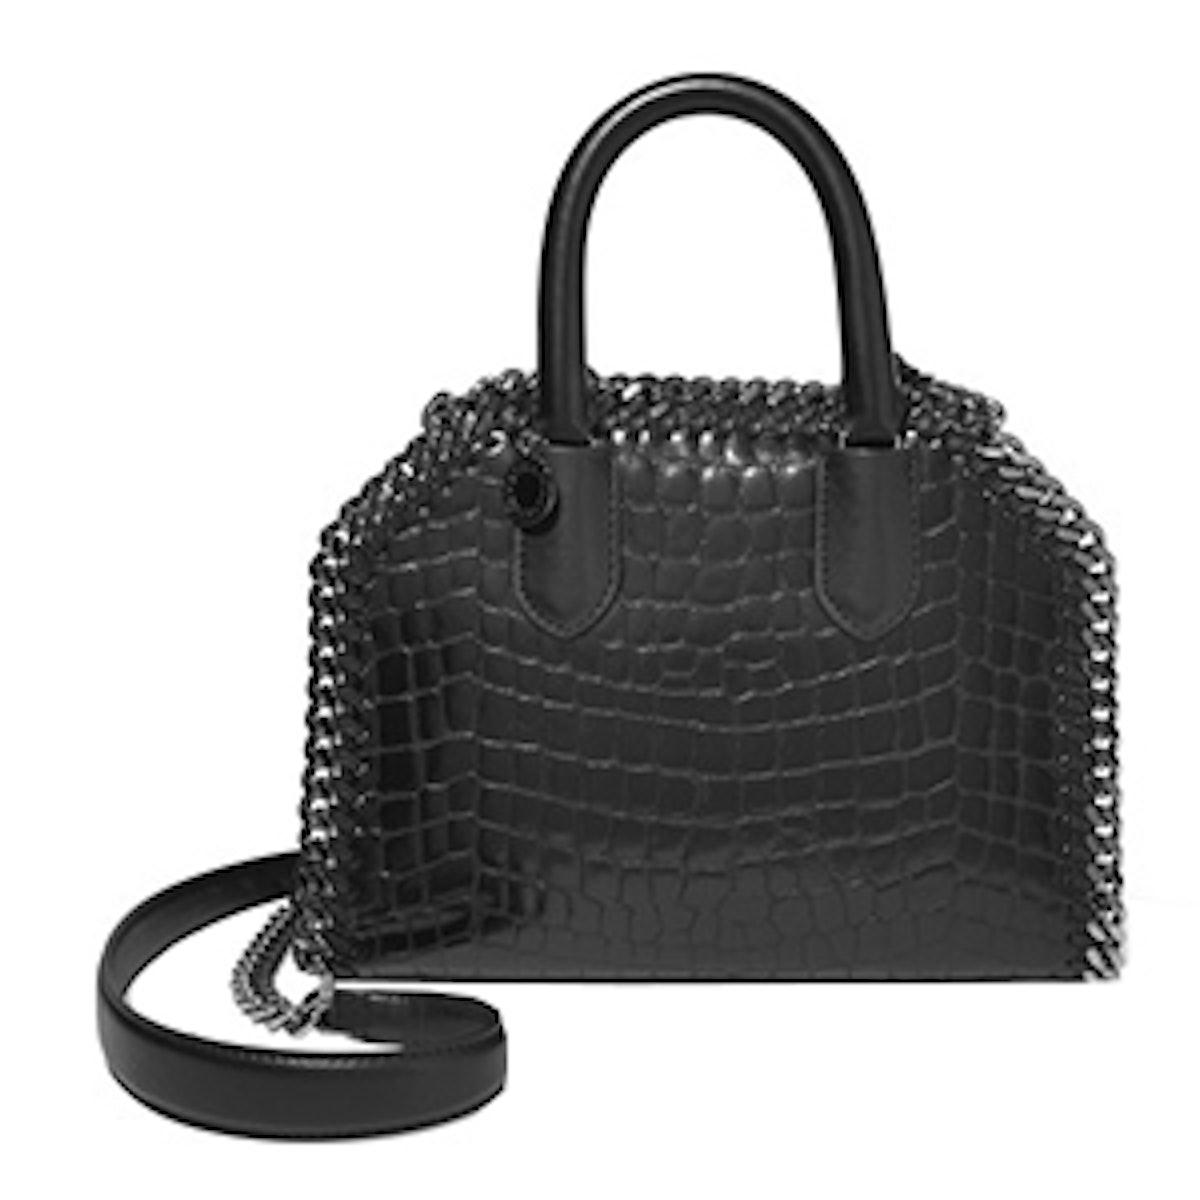 Falabella Croc-Effect Faux Leather Tote